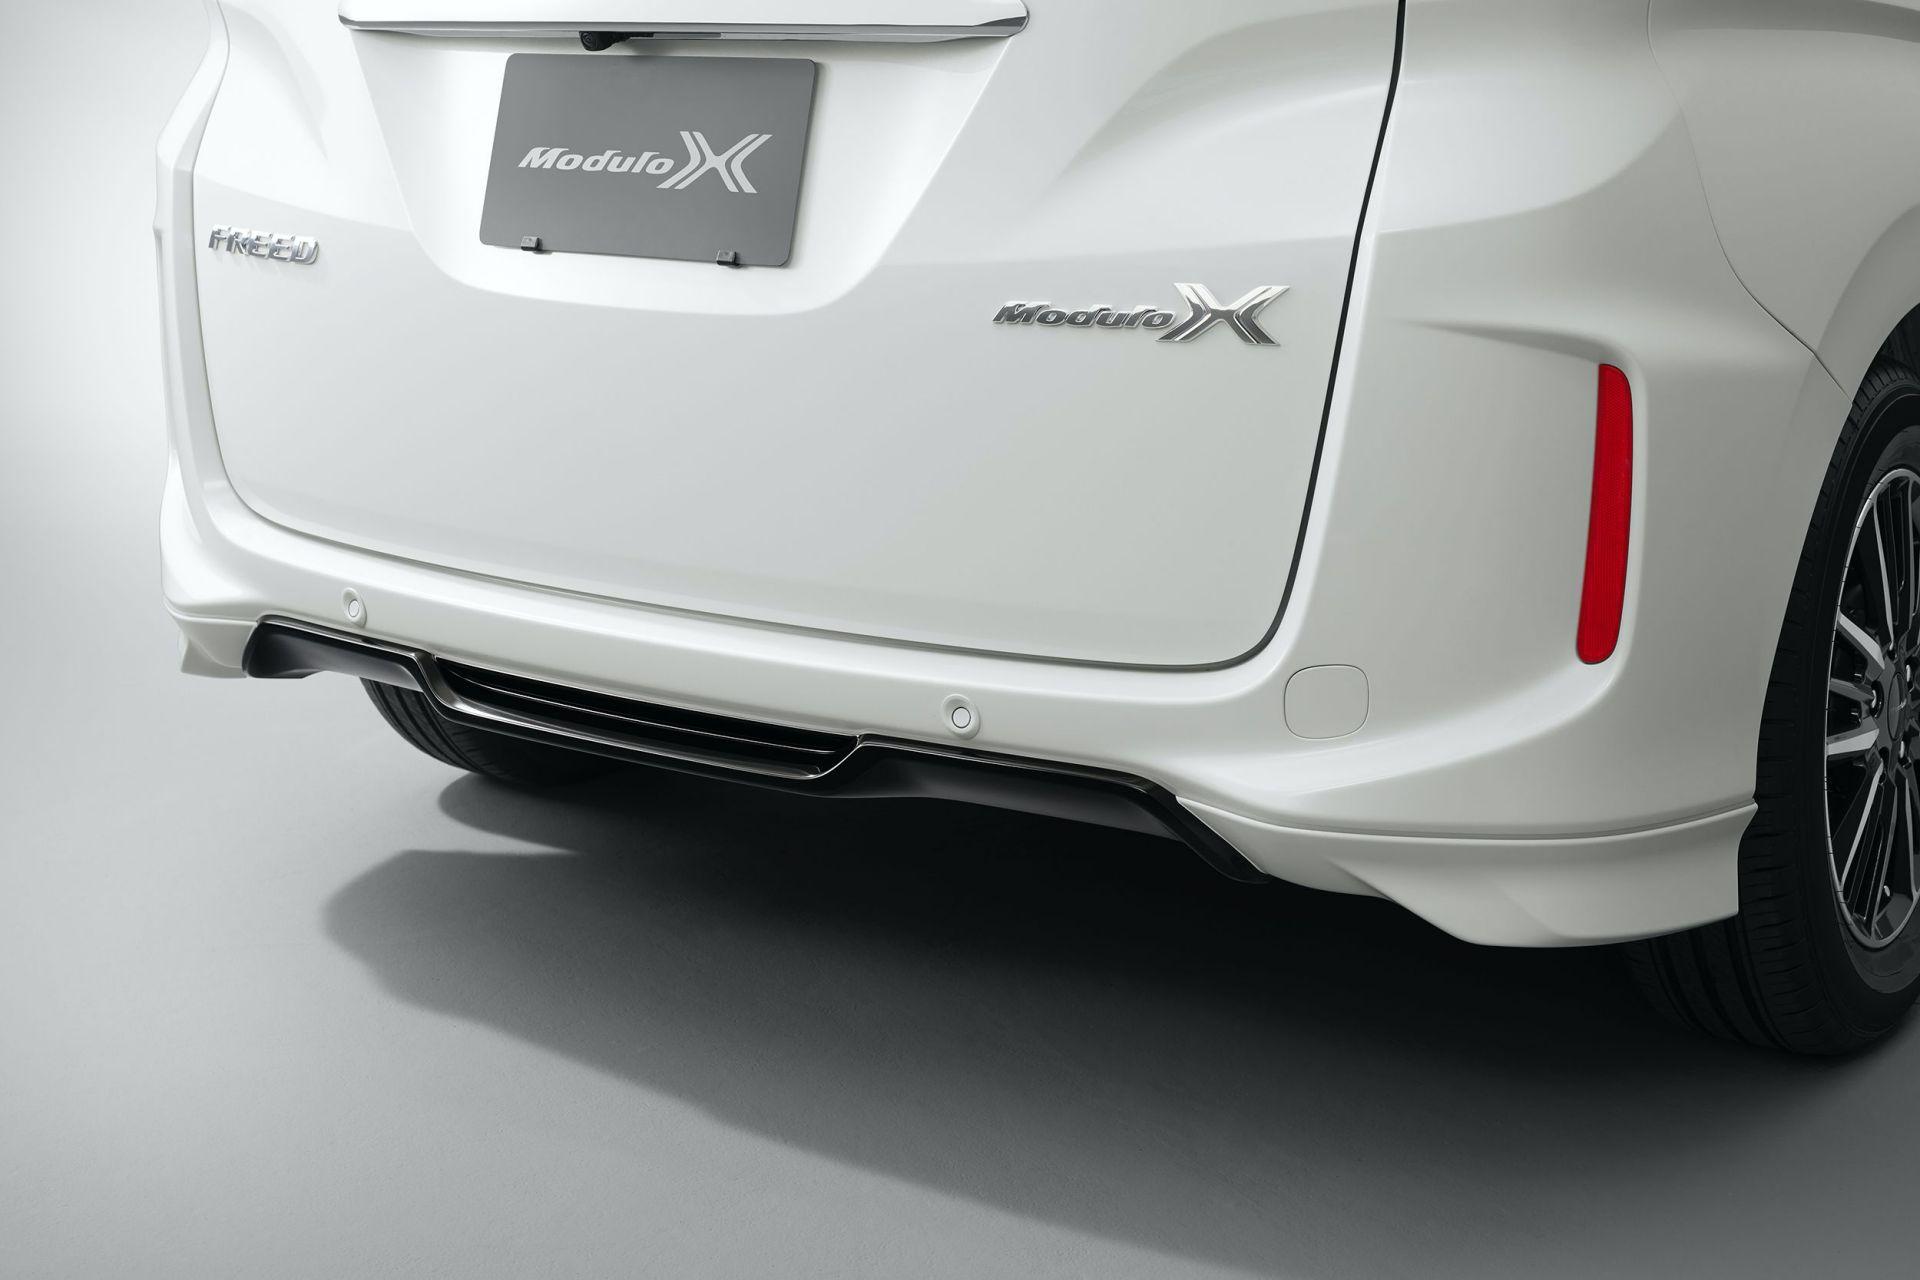 Honda-Freed-Modulo-X-Facelift-2020-39